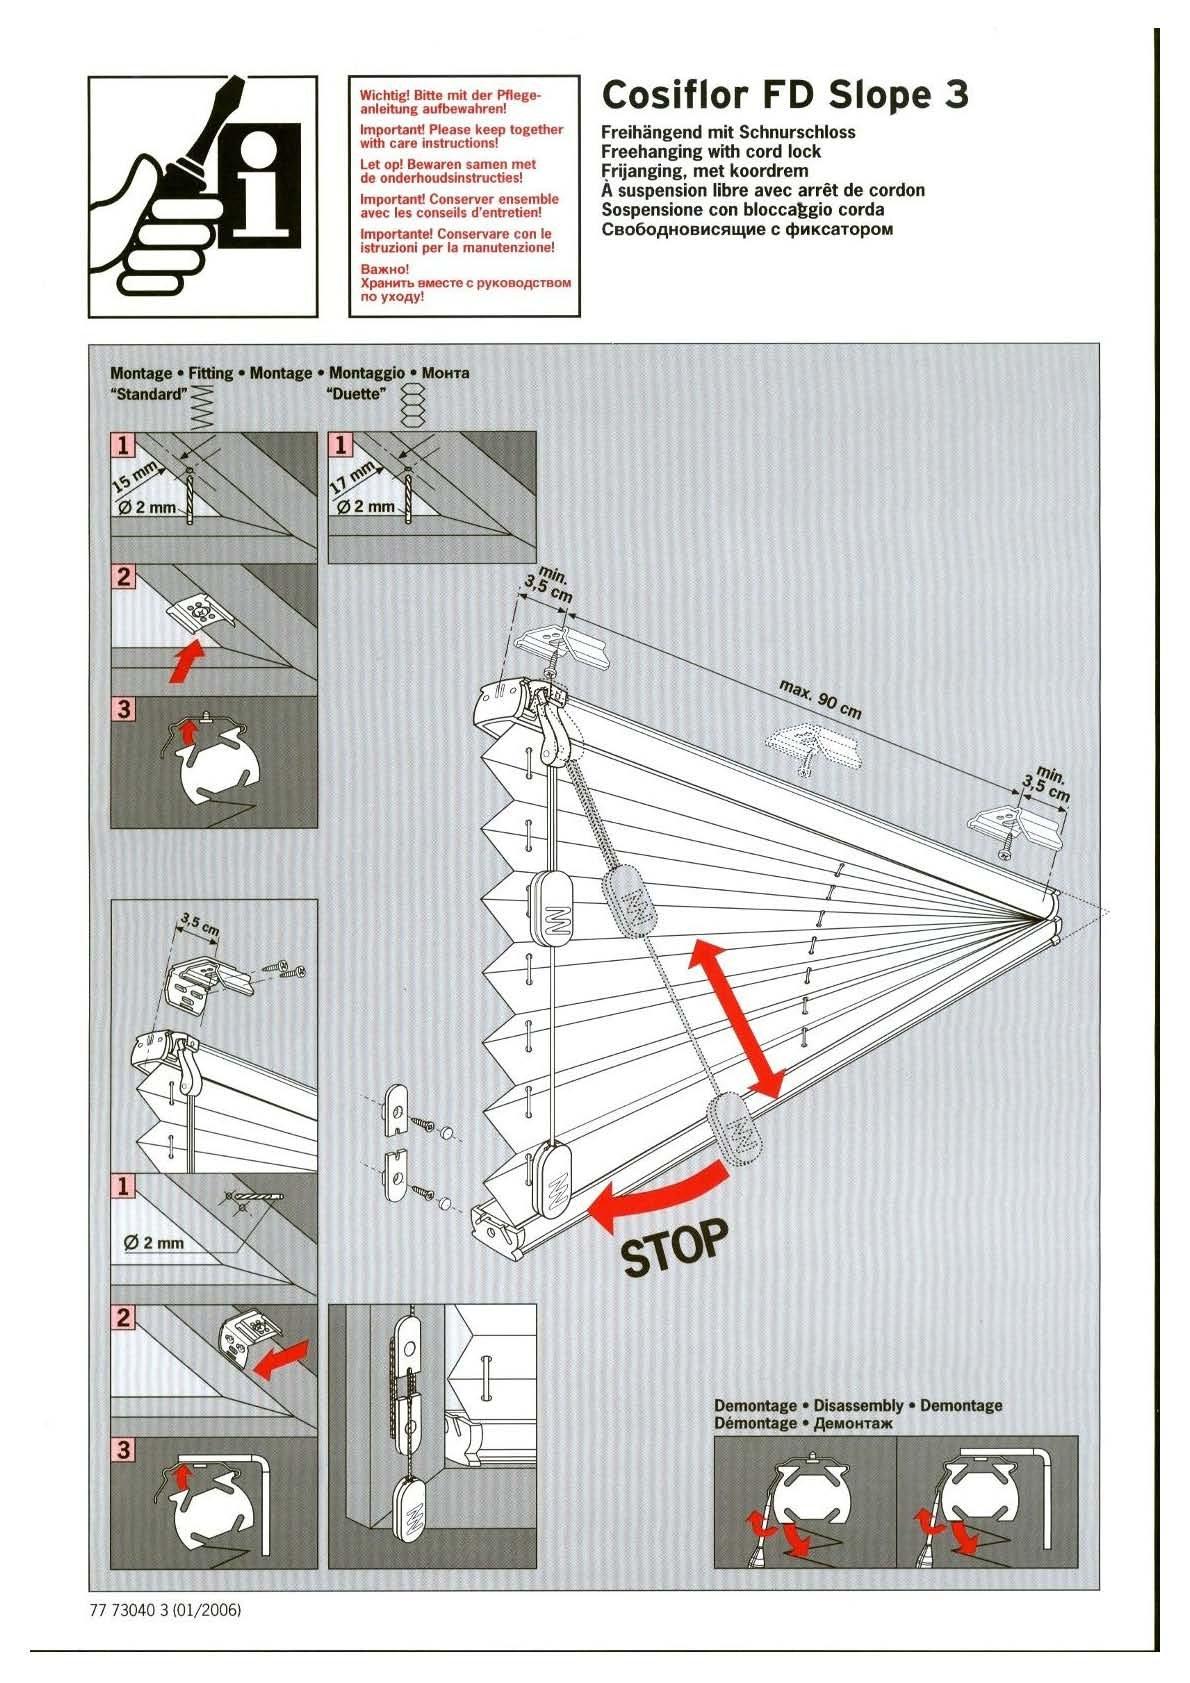 dreiecksfenster plissee cosiflor fd slope 3. Black Bedroom Furniture Sets. Home Design Ideas